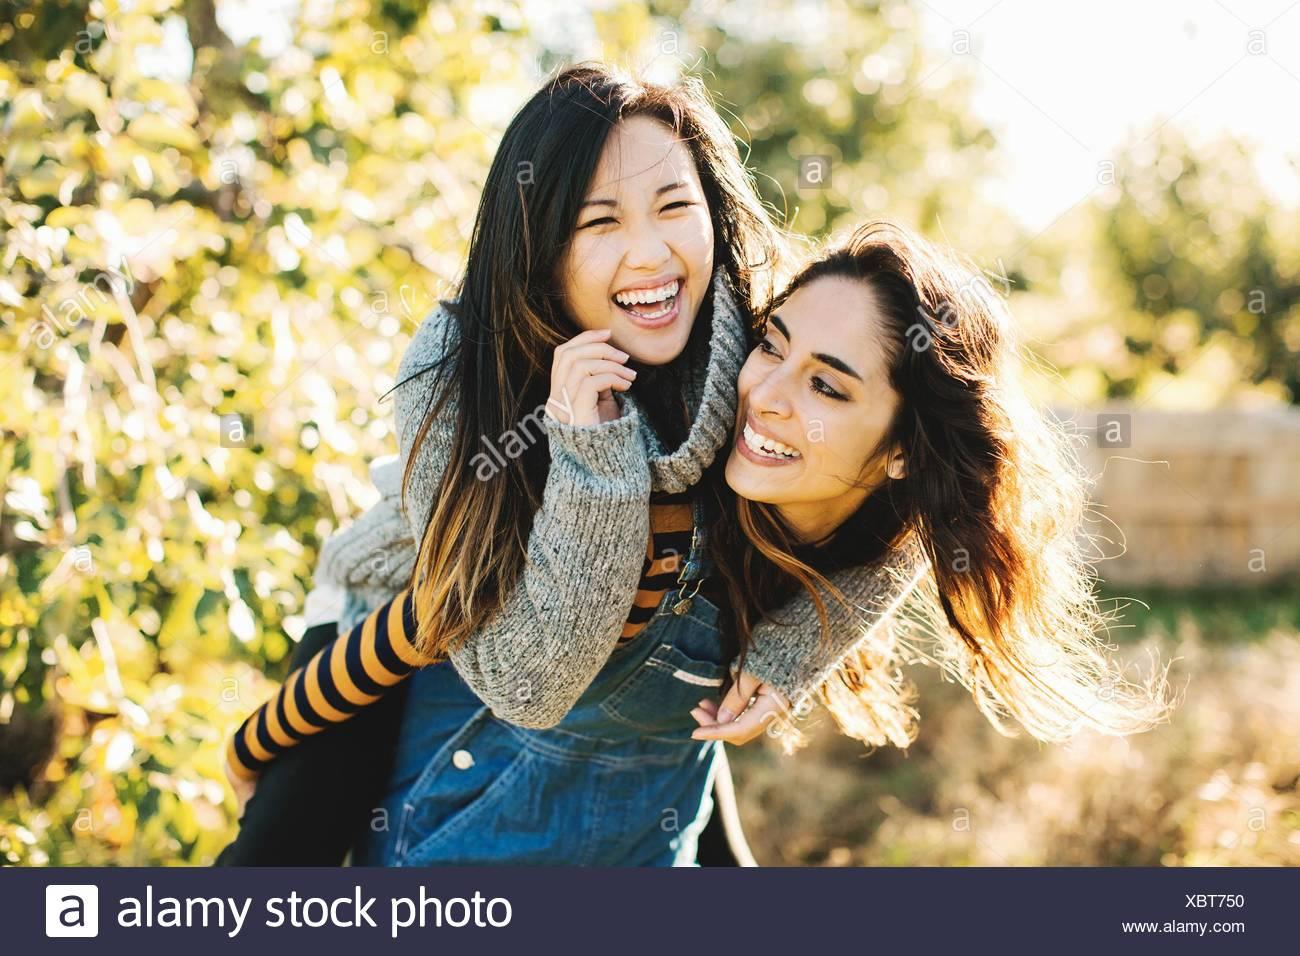 Mujer joven dando amigo piggyback ride, exteriores Imagen De Stock